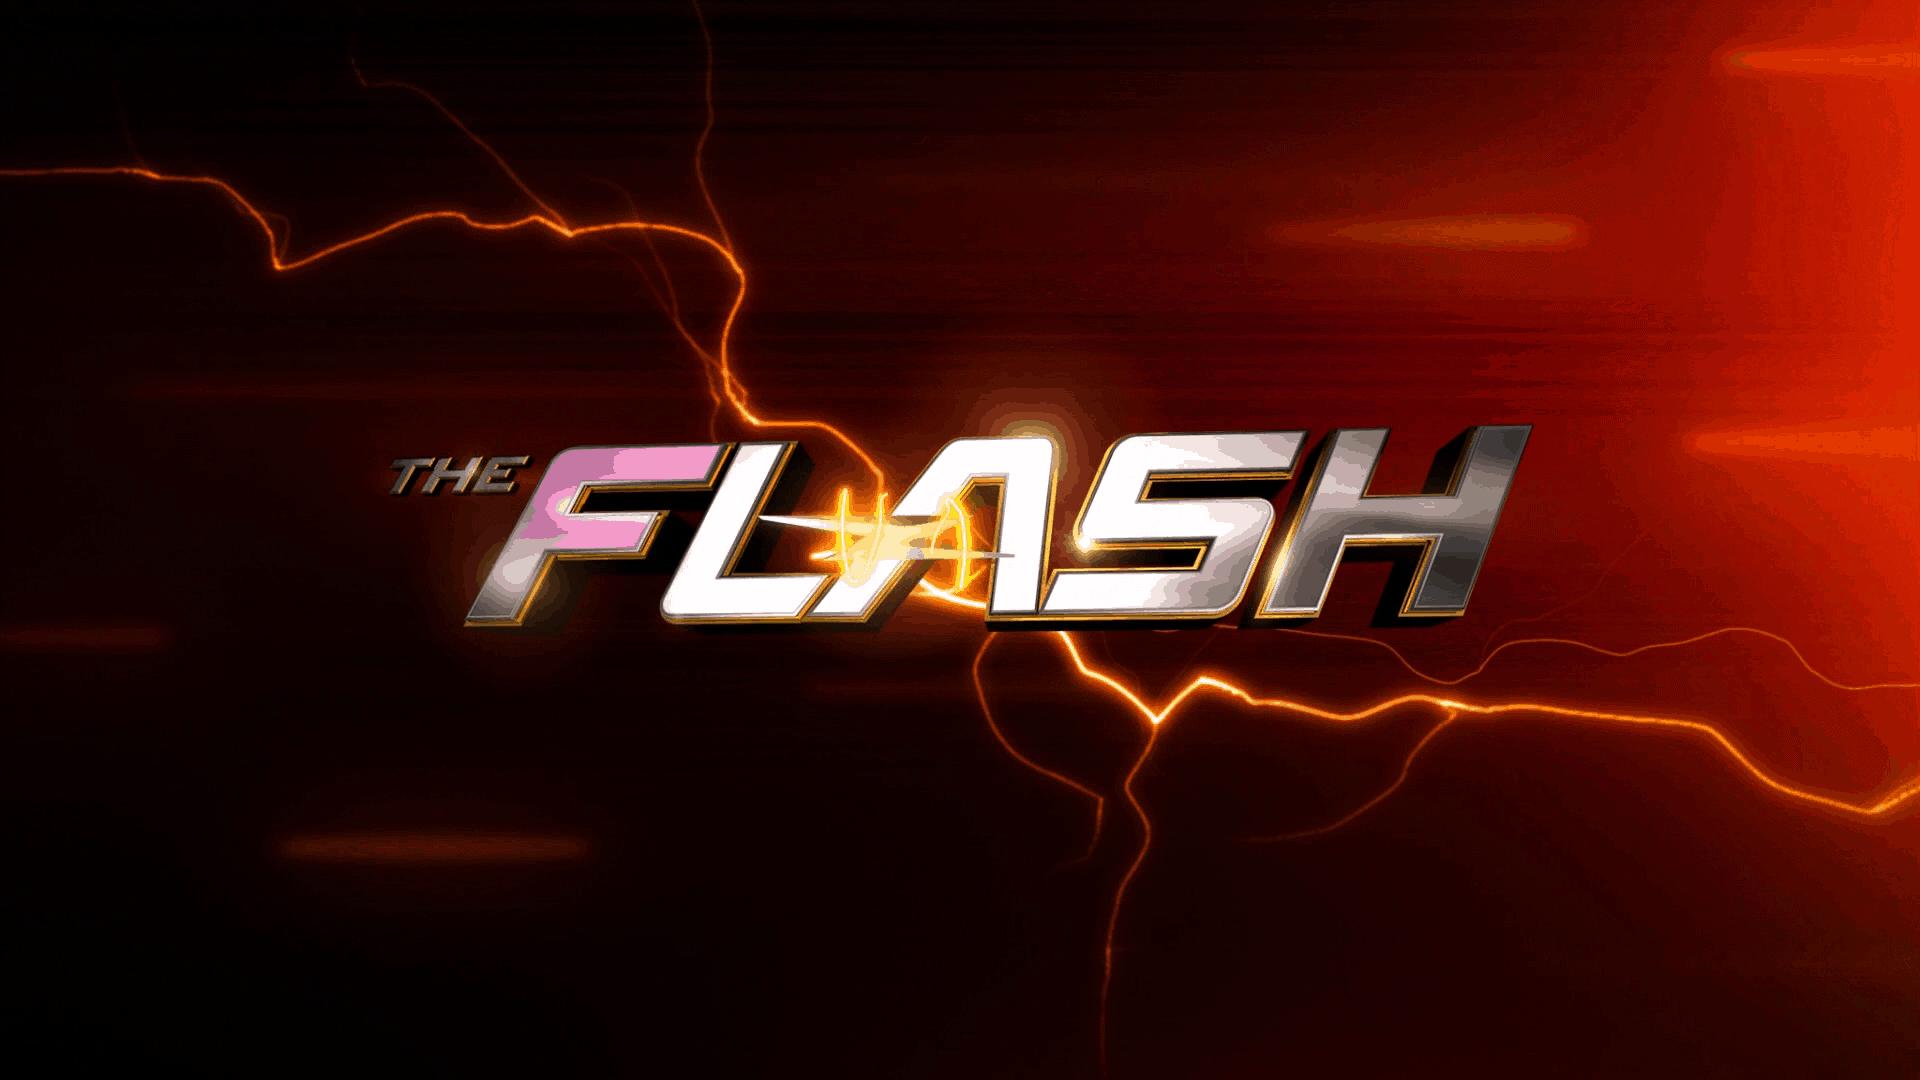 the flash season 6 title